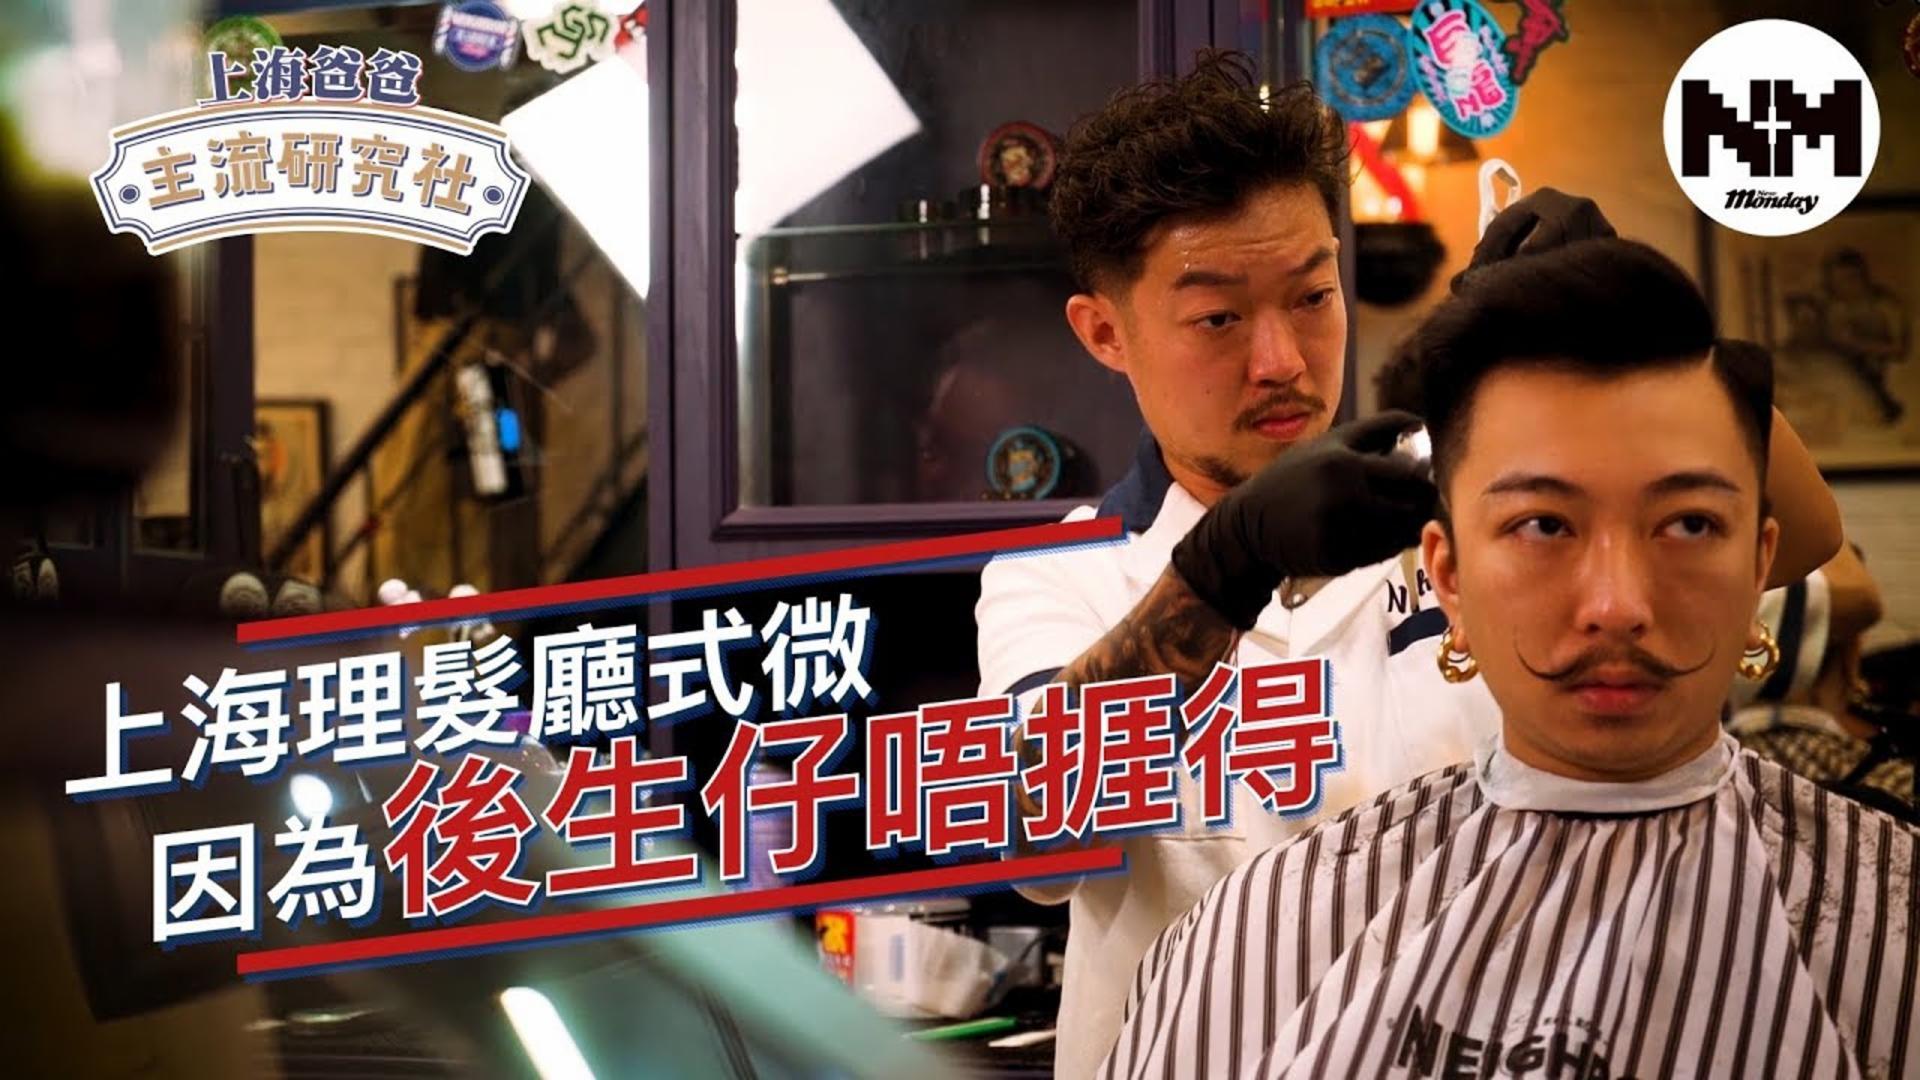 EP4【主流研究社】Barber Shop店主專訪:啲後生仔根本唔捱得!|上海爸爸